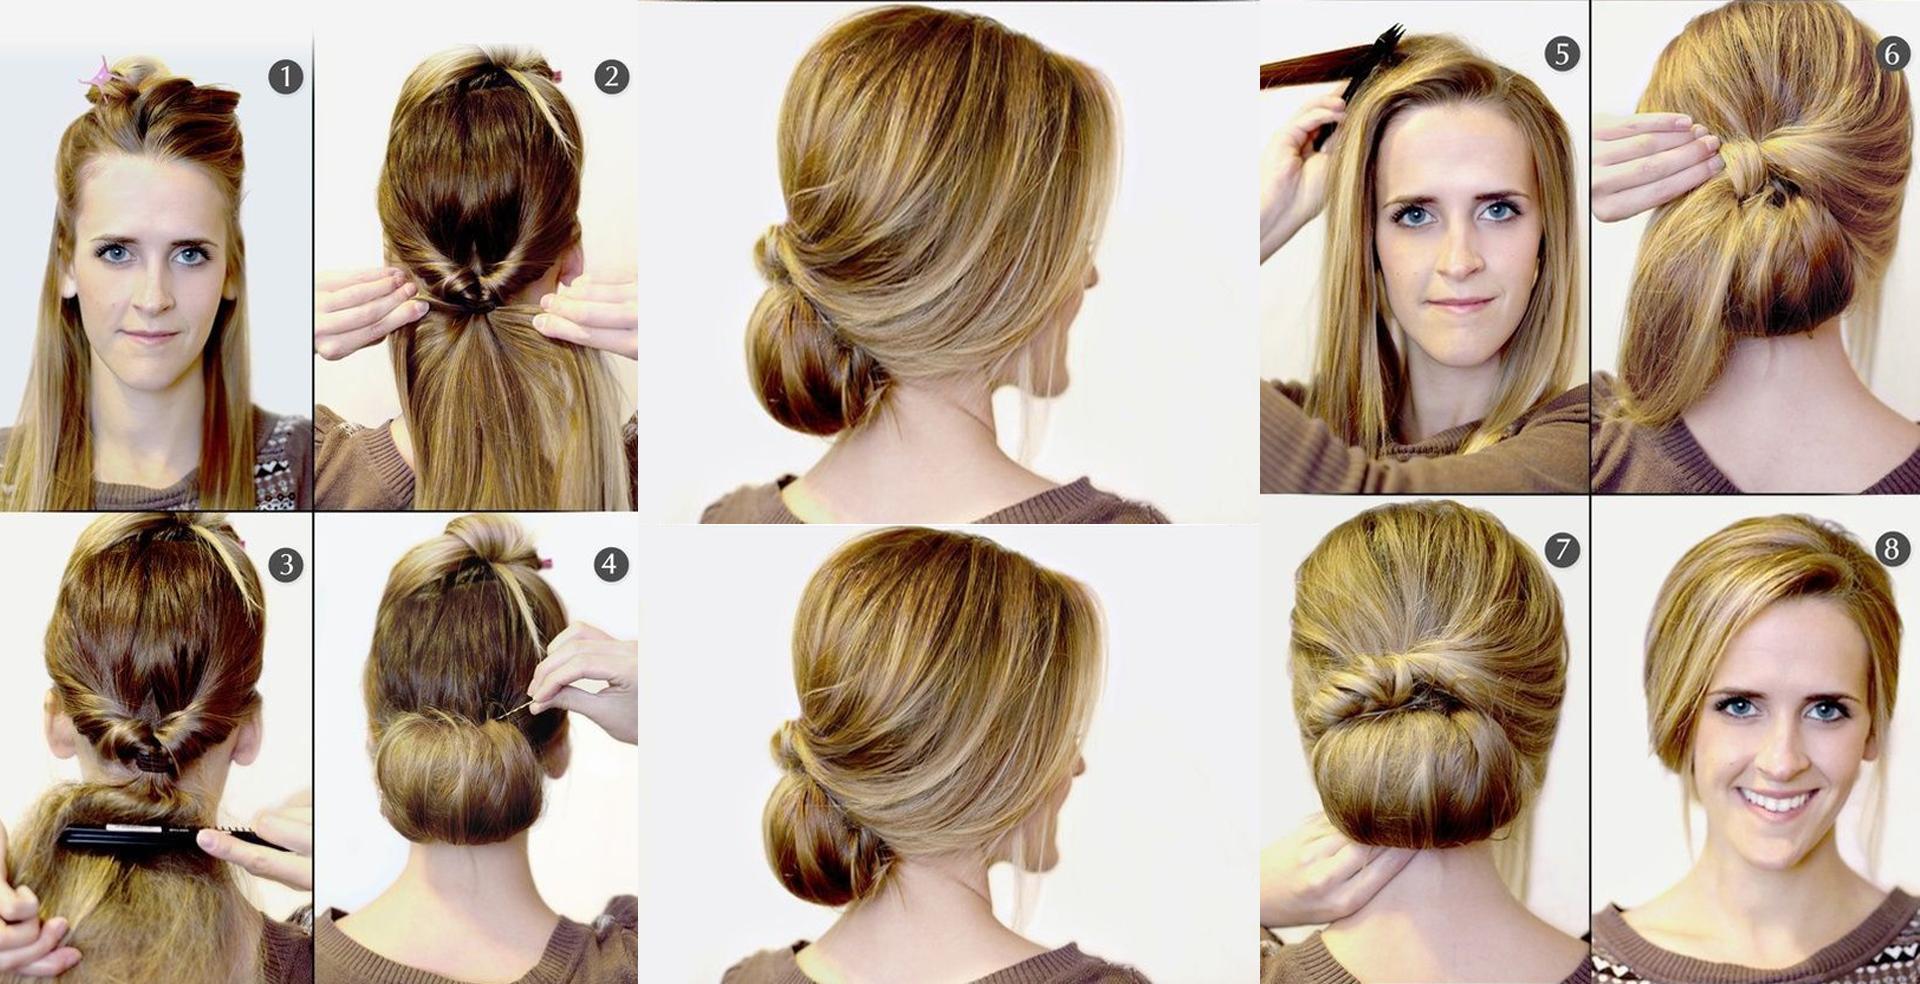 15 Peinados Para Fiestas Que Son Totalmente Fantasticos